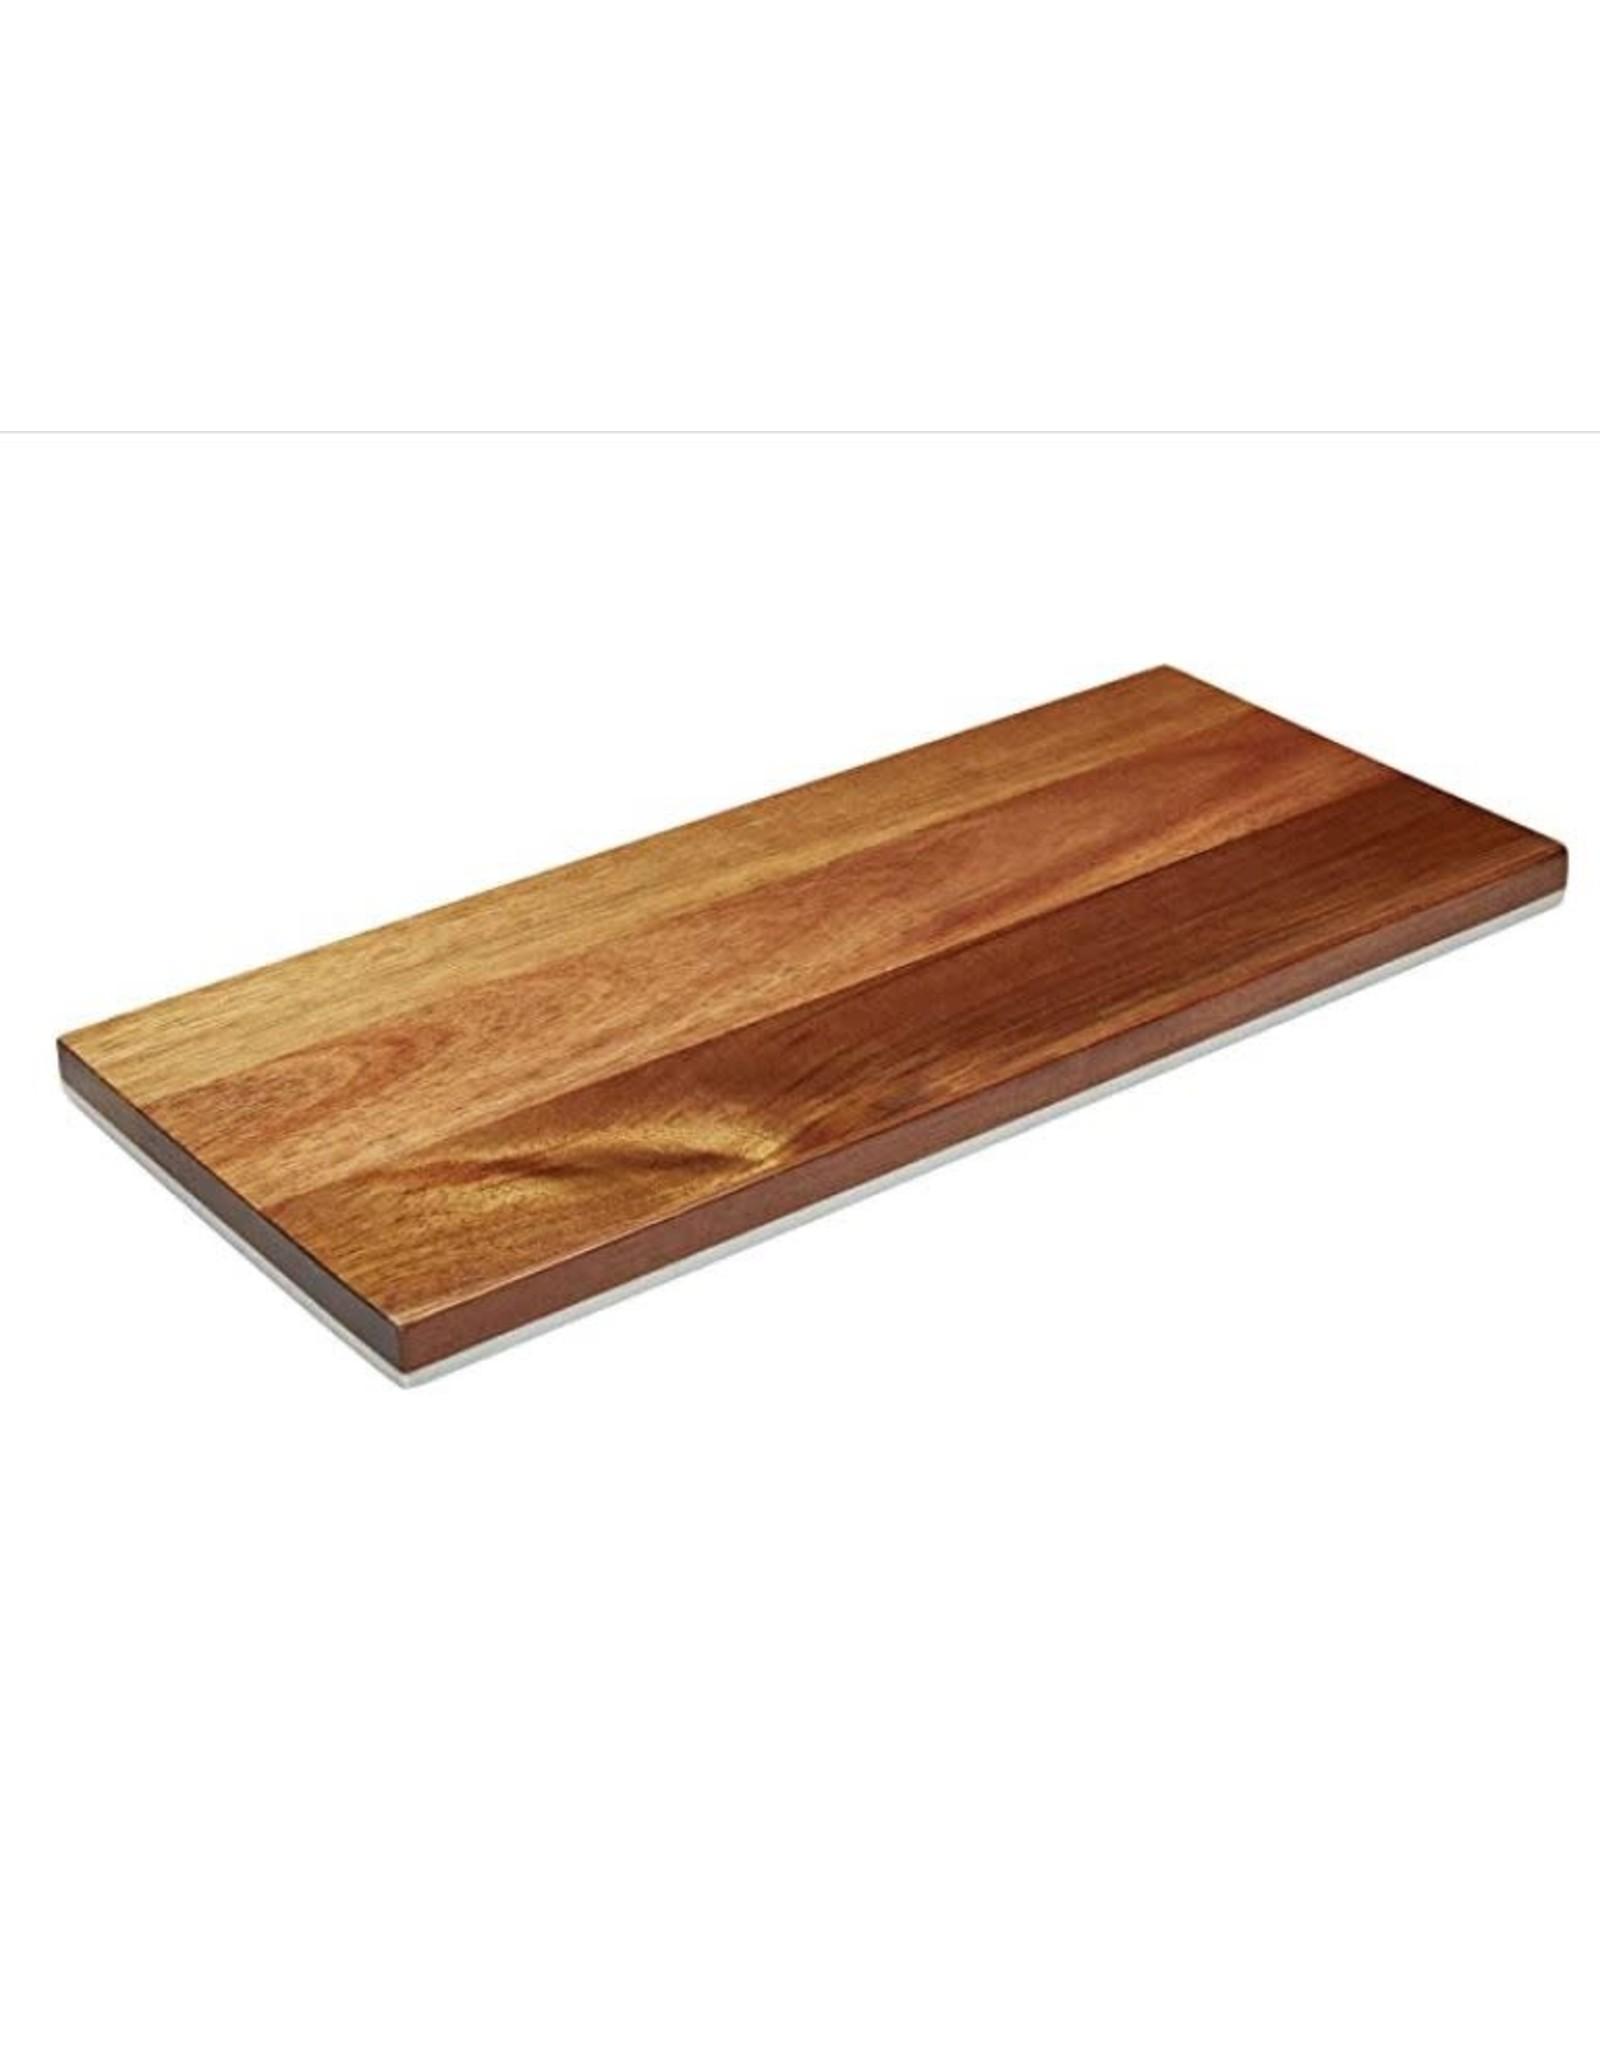 "8x8"" Prep & Serve Wooden & Marble  Board"